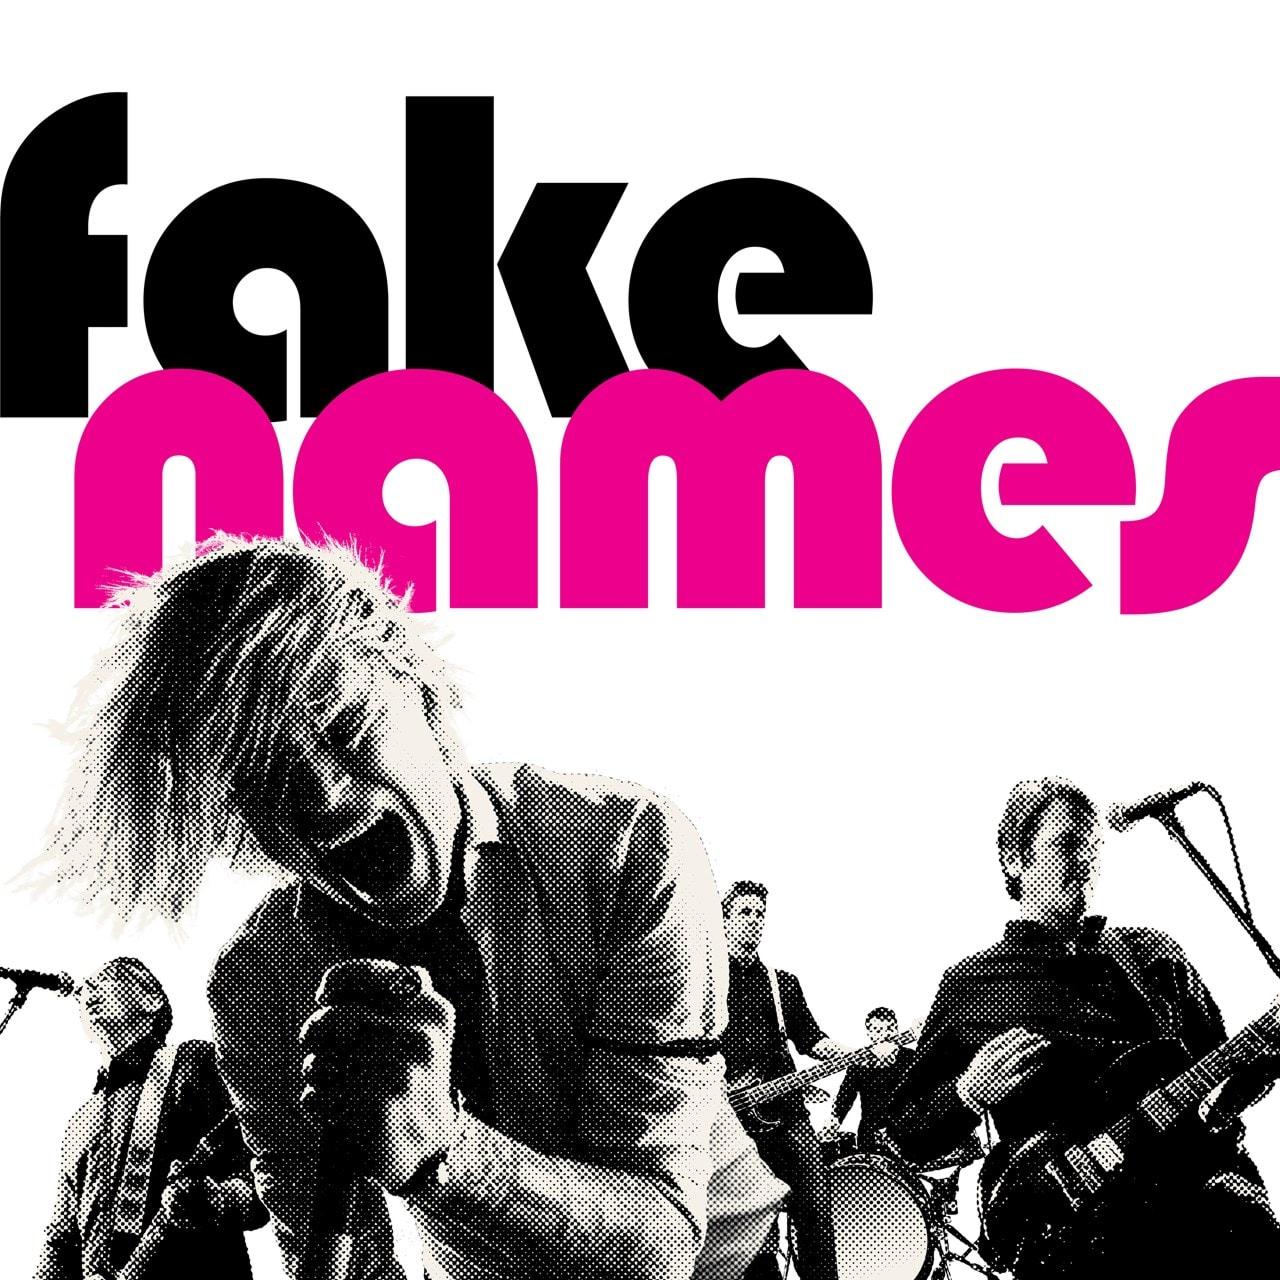 Fake Names - 1